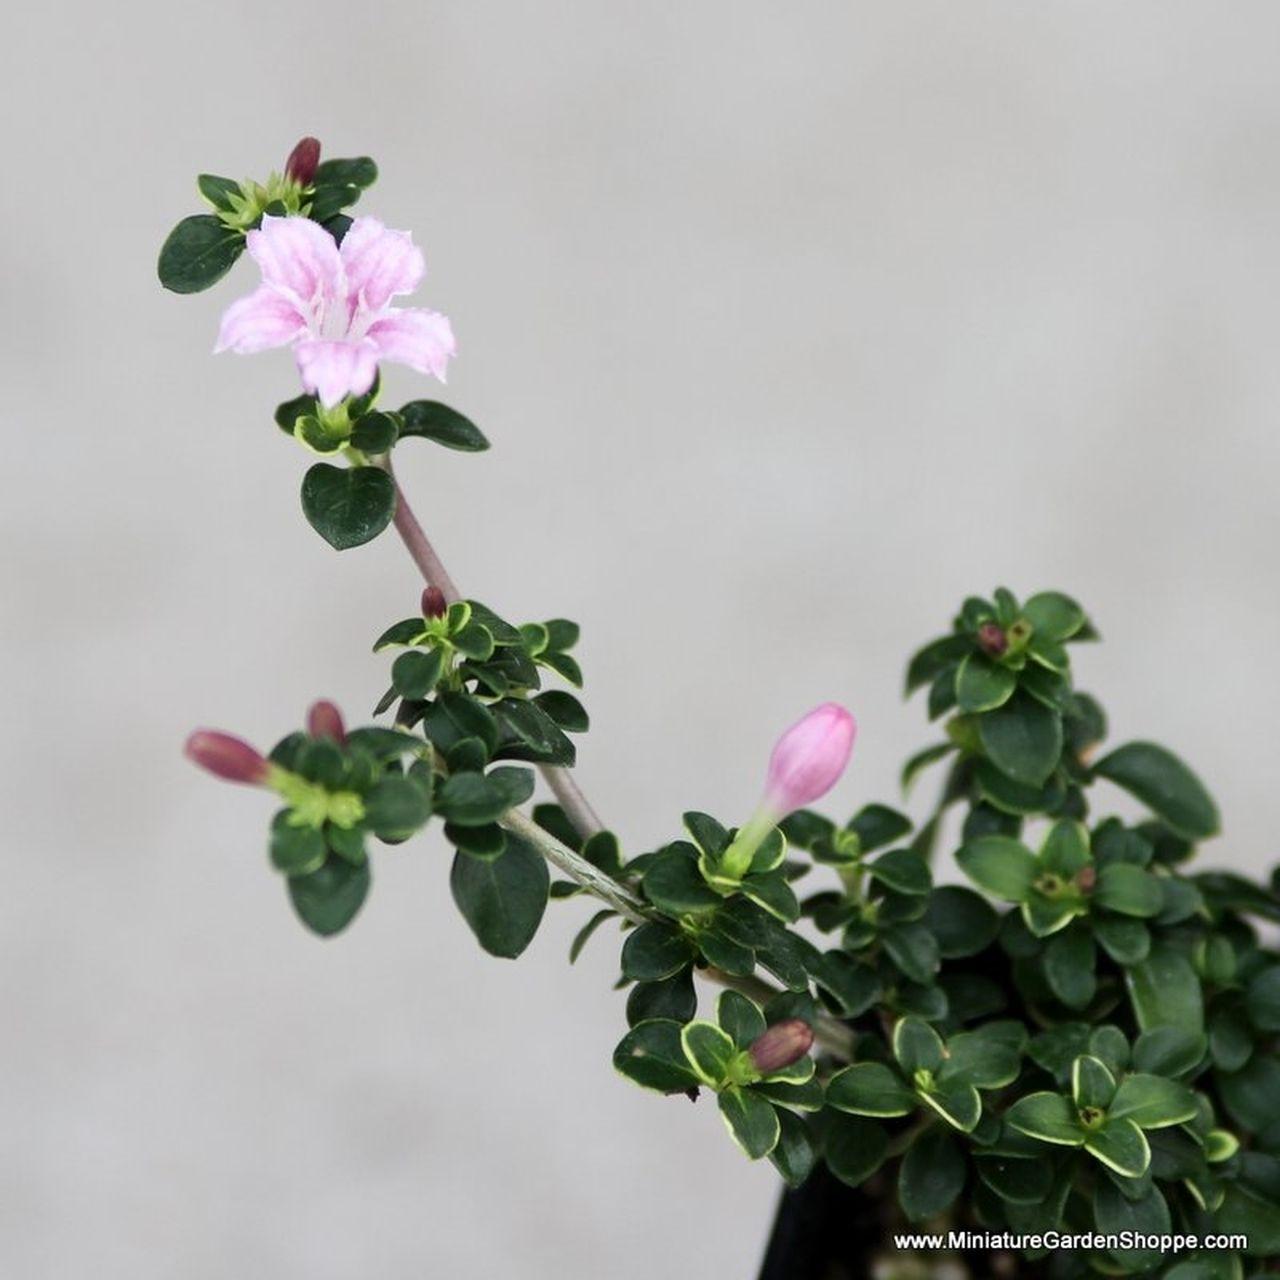 Serissa Foetida Cherry Blossom Rose Like Flowers Miniature Garden Plants Miniature Plants